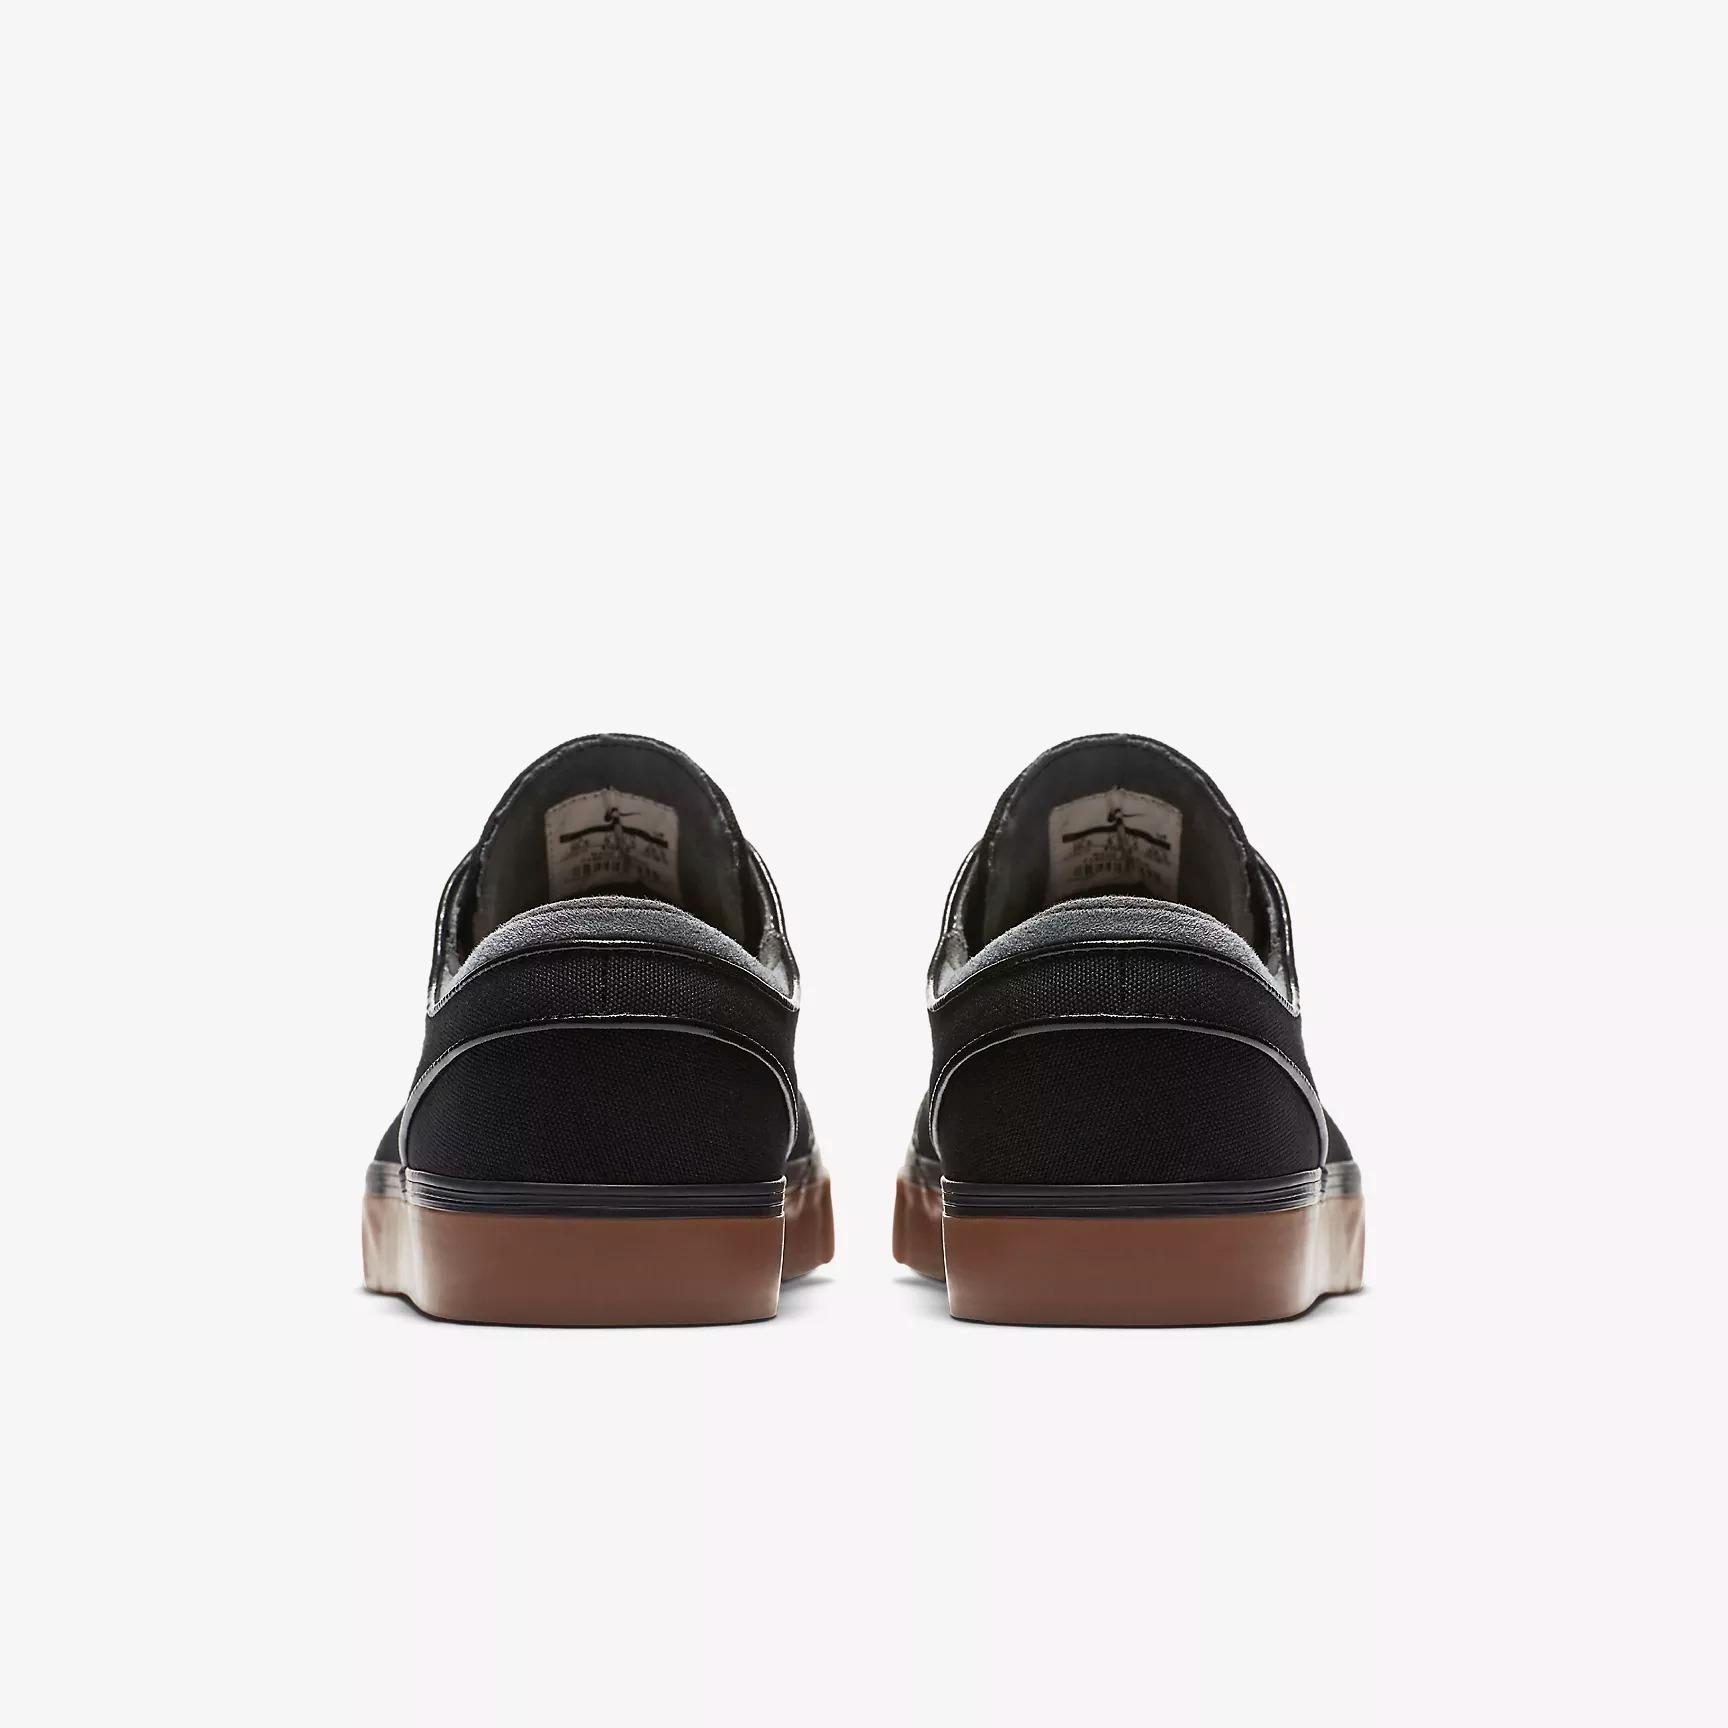 d35743060a48 Nike SB Zoom Stefan Janoski Canvas Skateboarding Shoes - SPORT SHOES ...